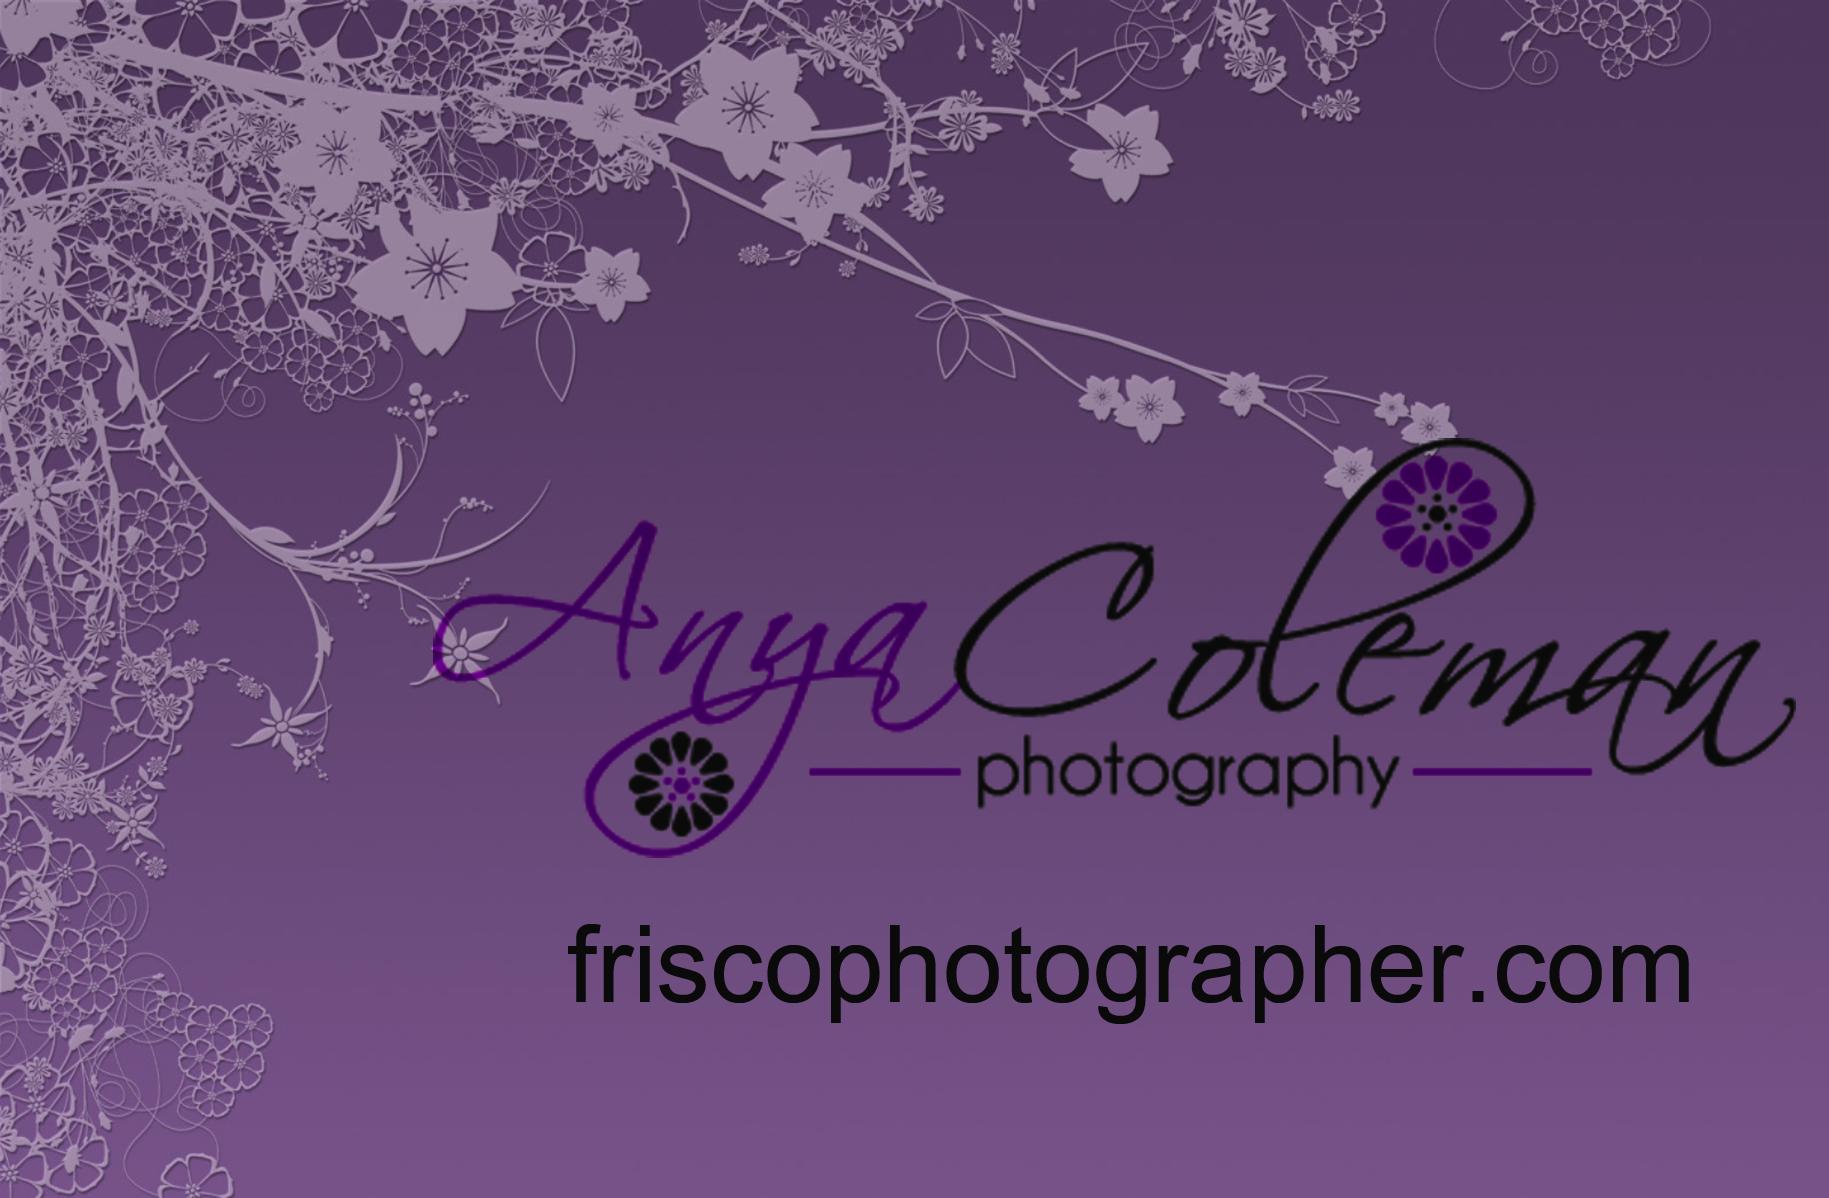 Anya Coleman Photography